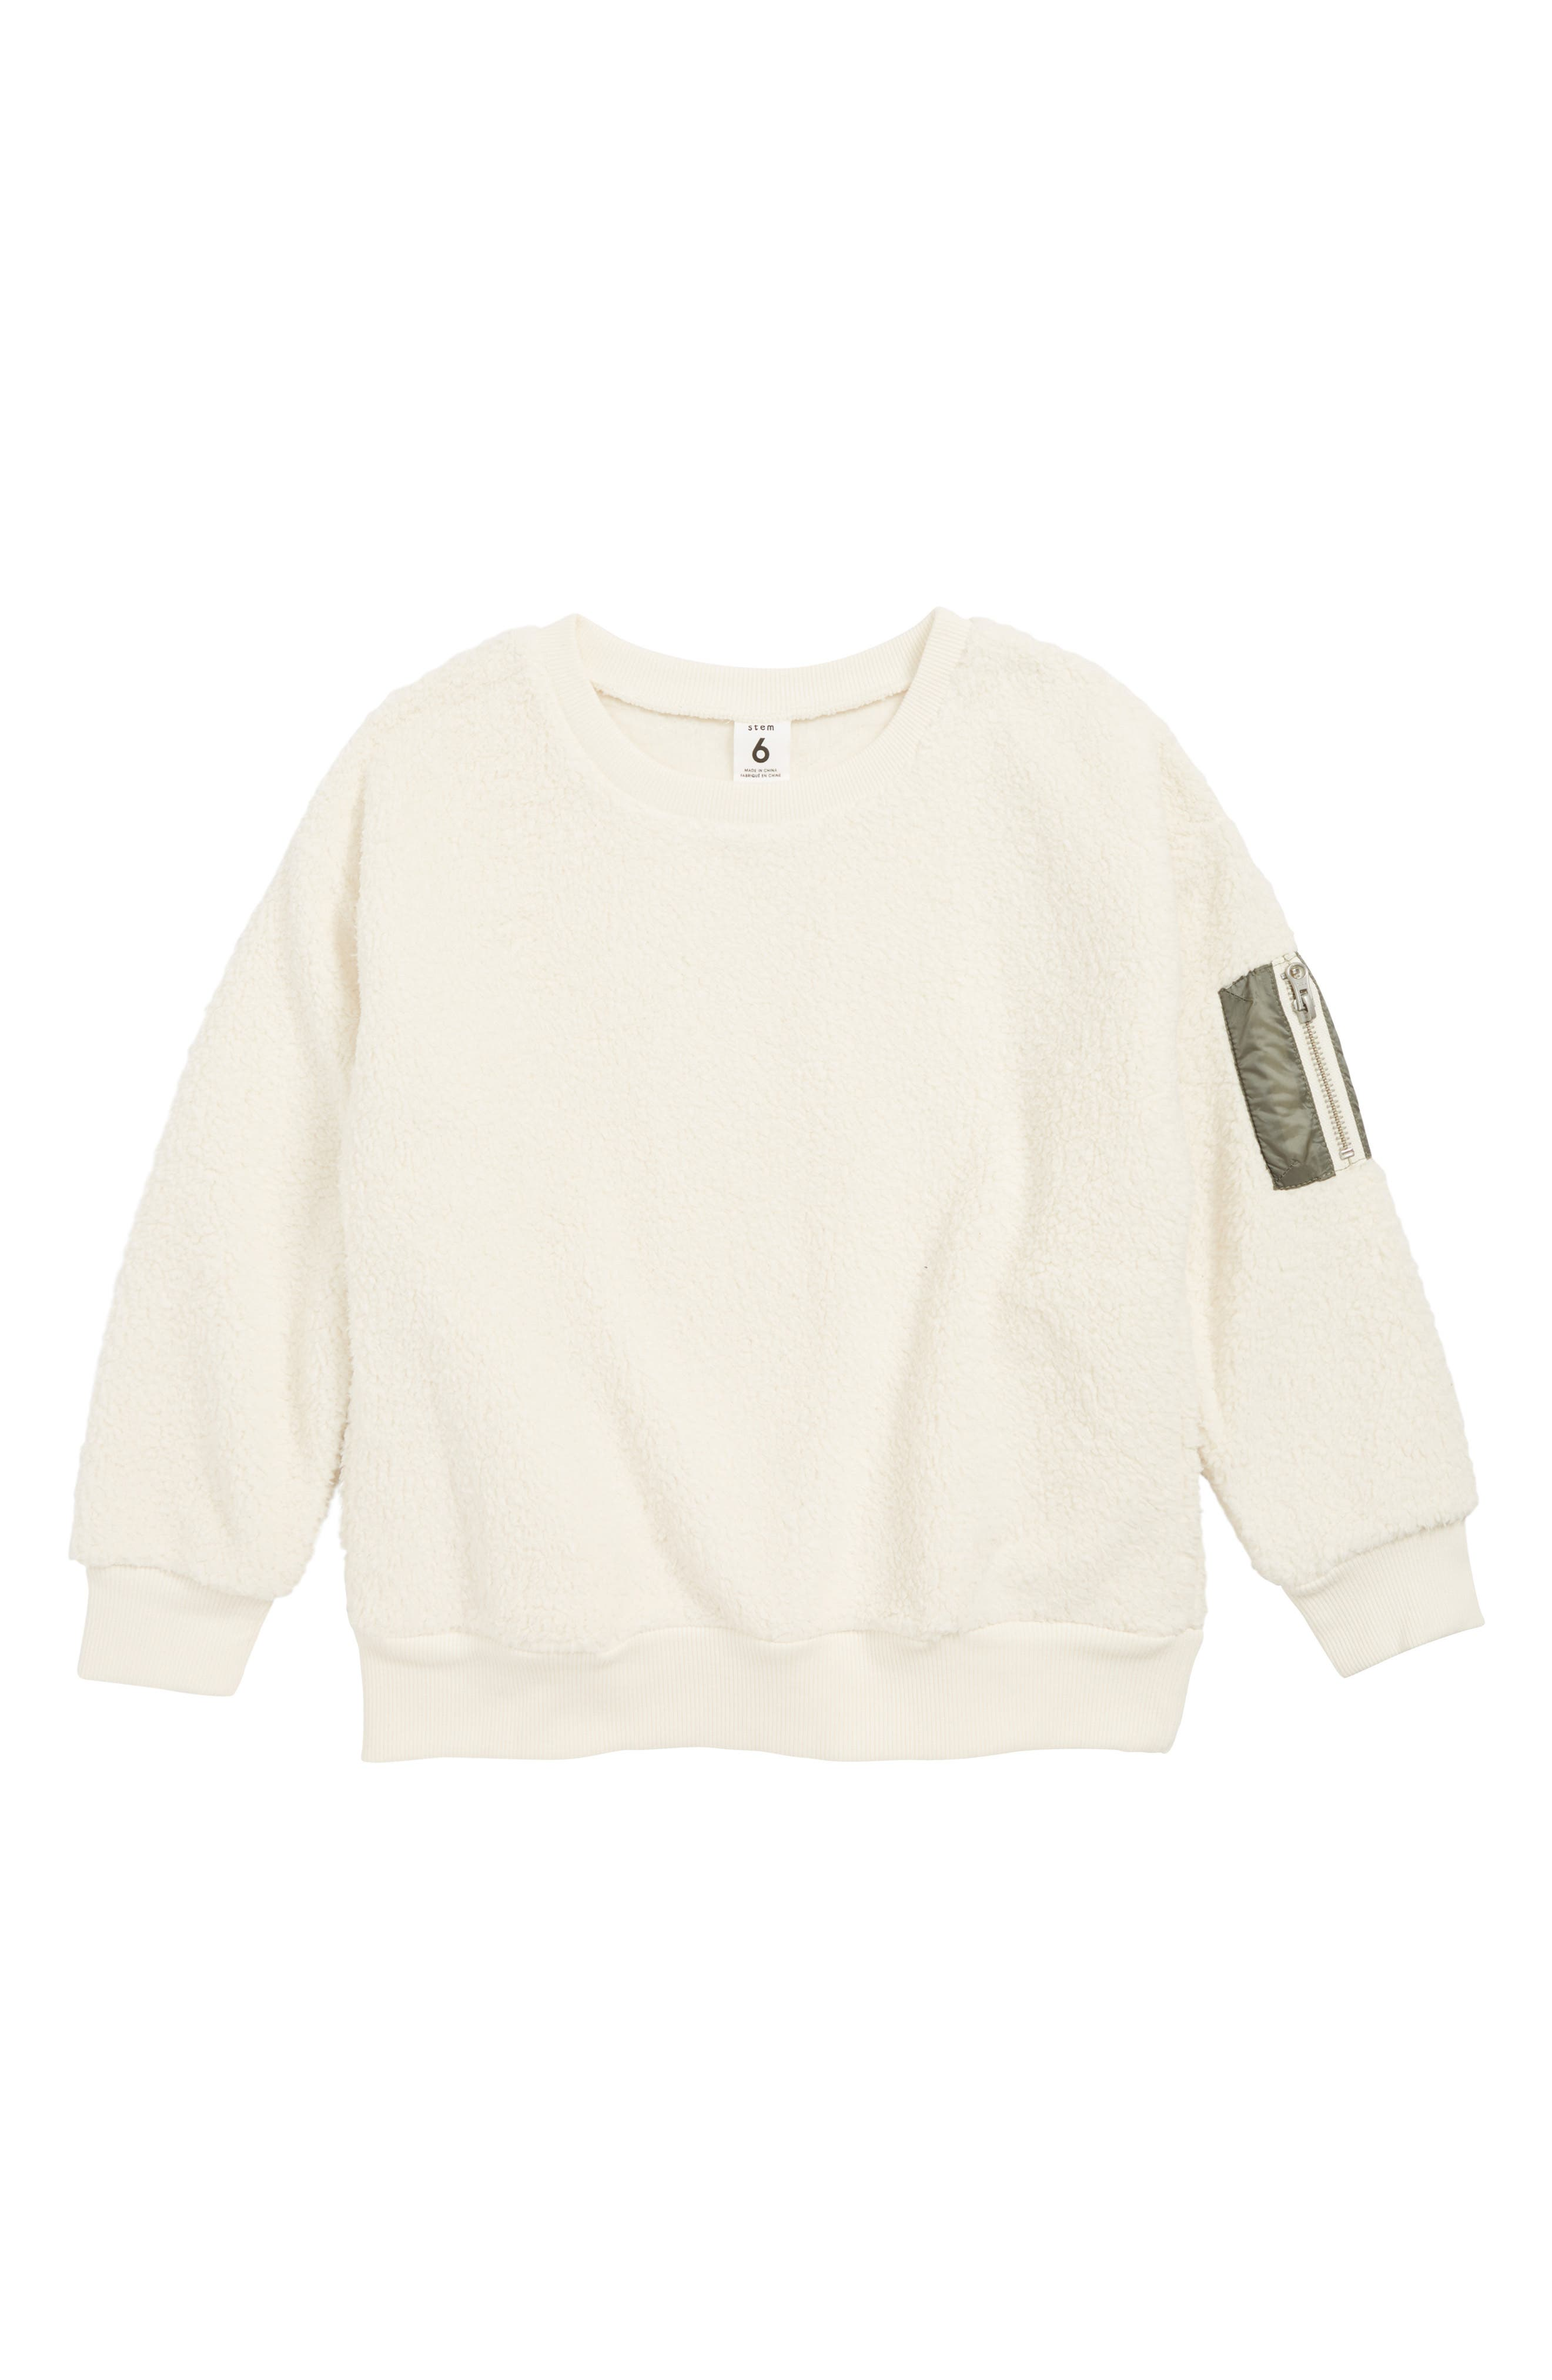 STEM Teddy Sweatshirt, Main, color, 900